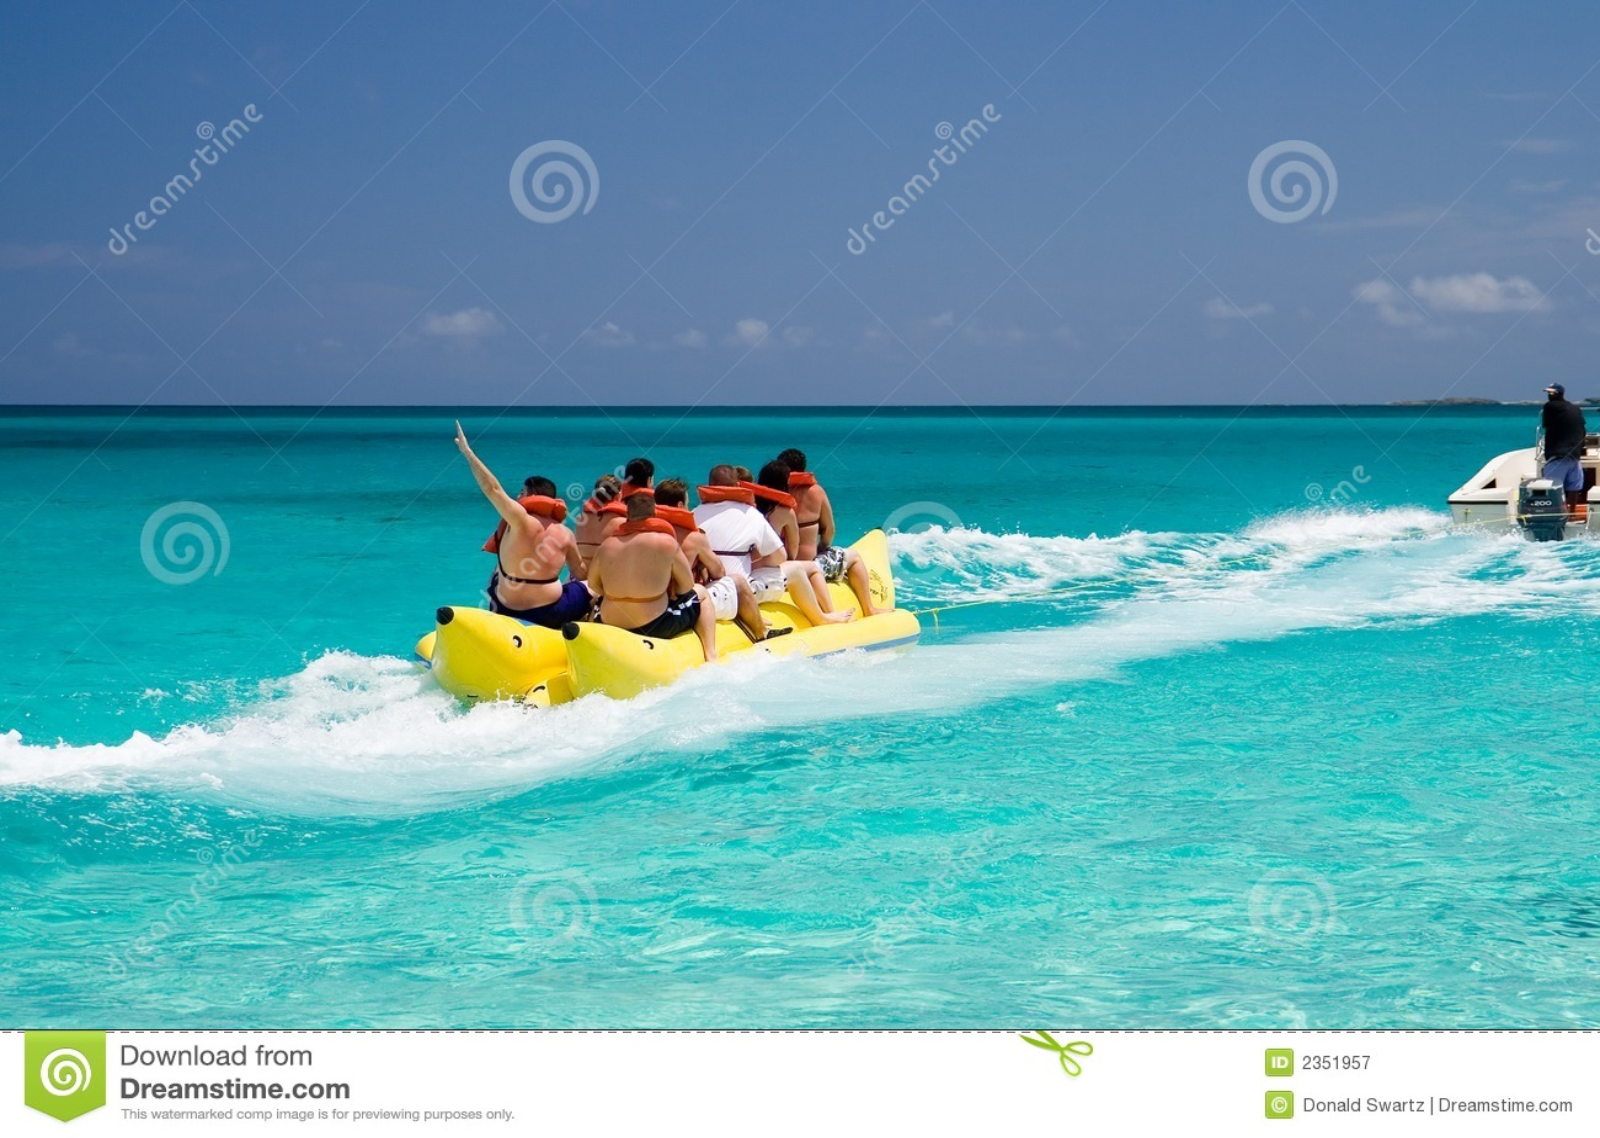 Island Discount Tire Orange Beach